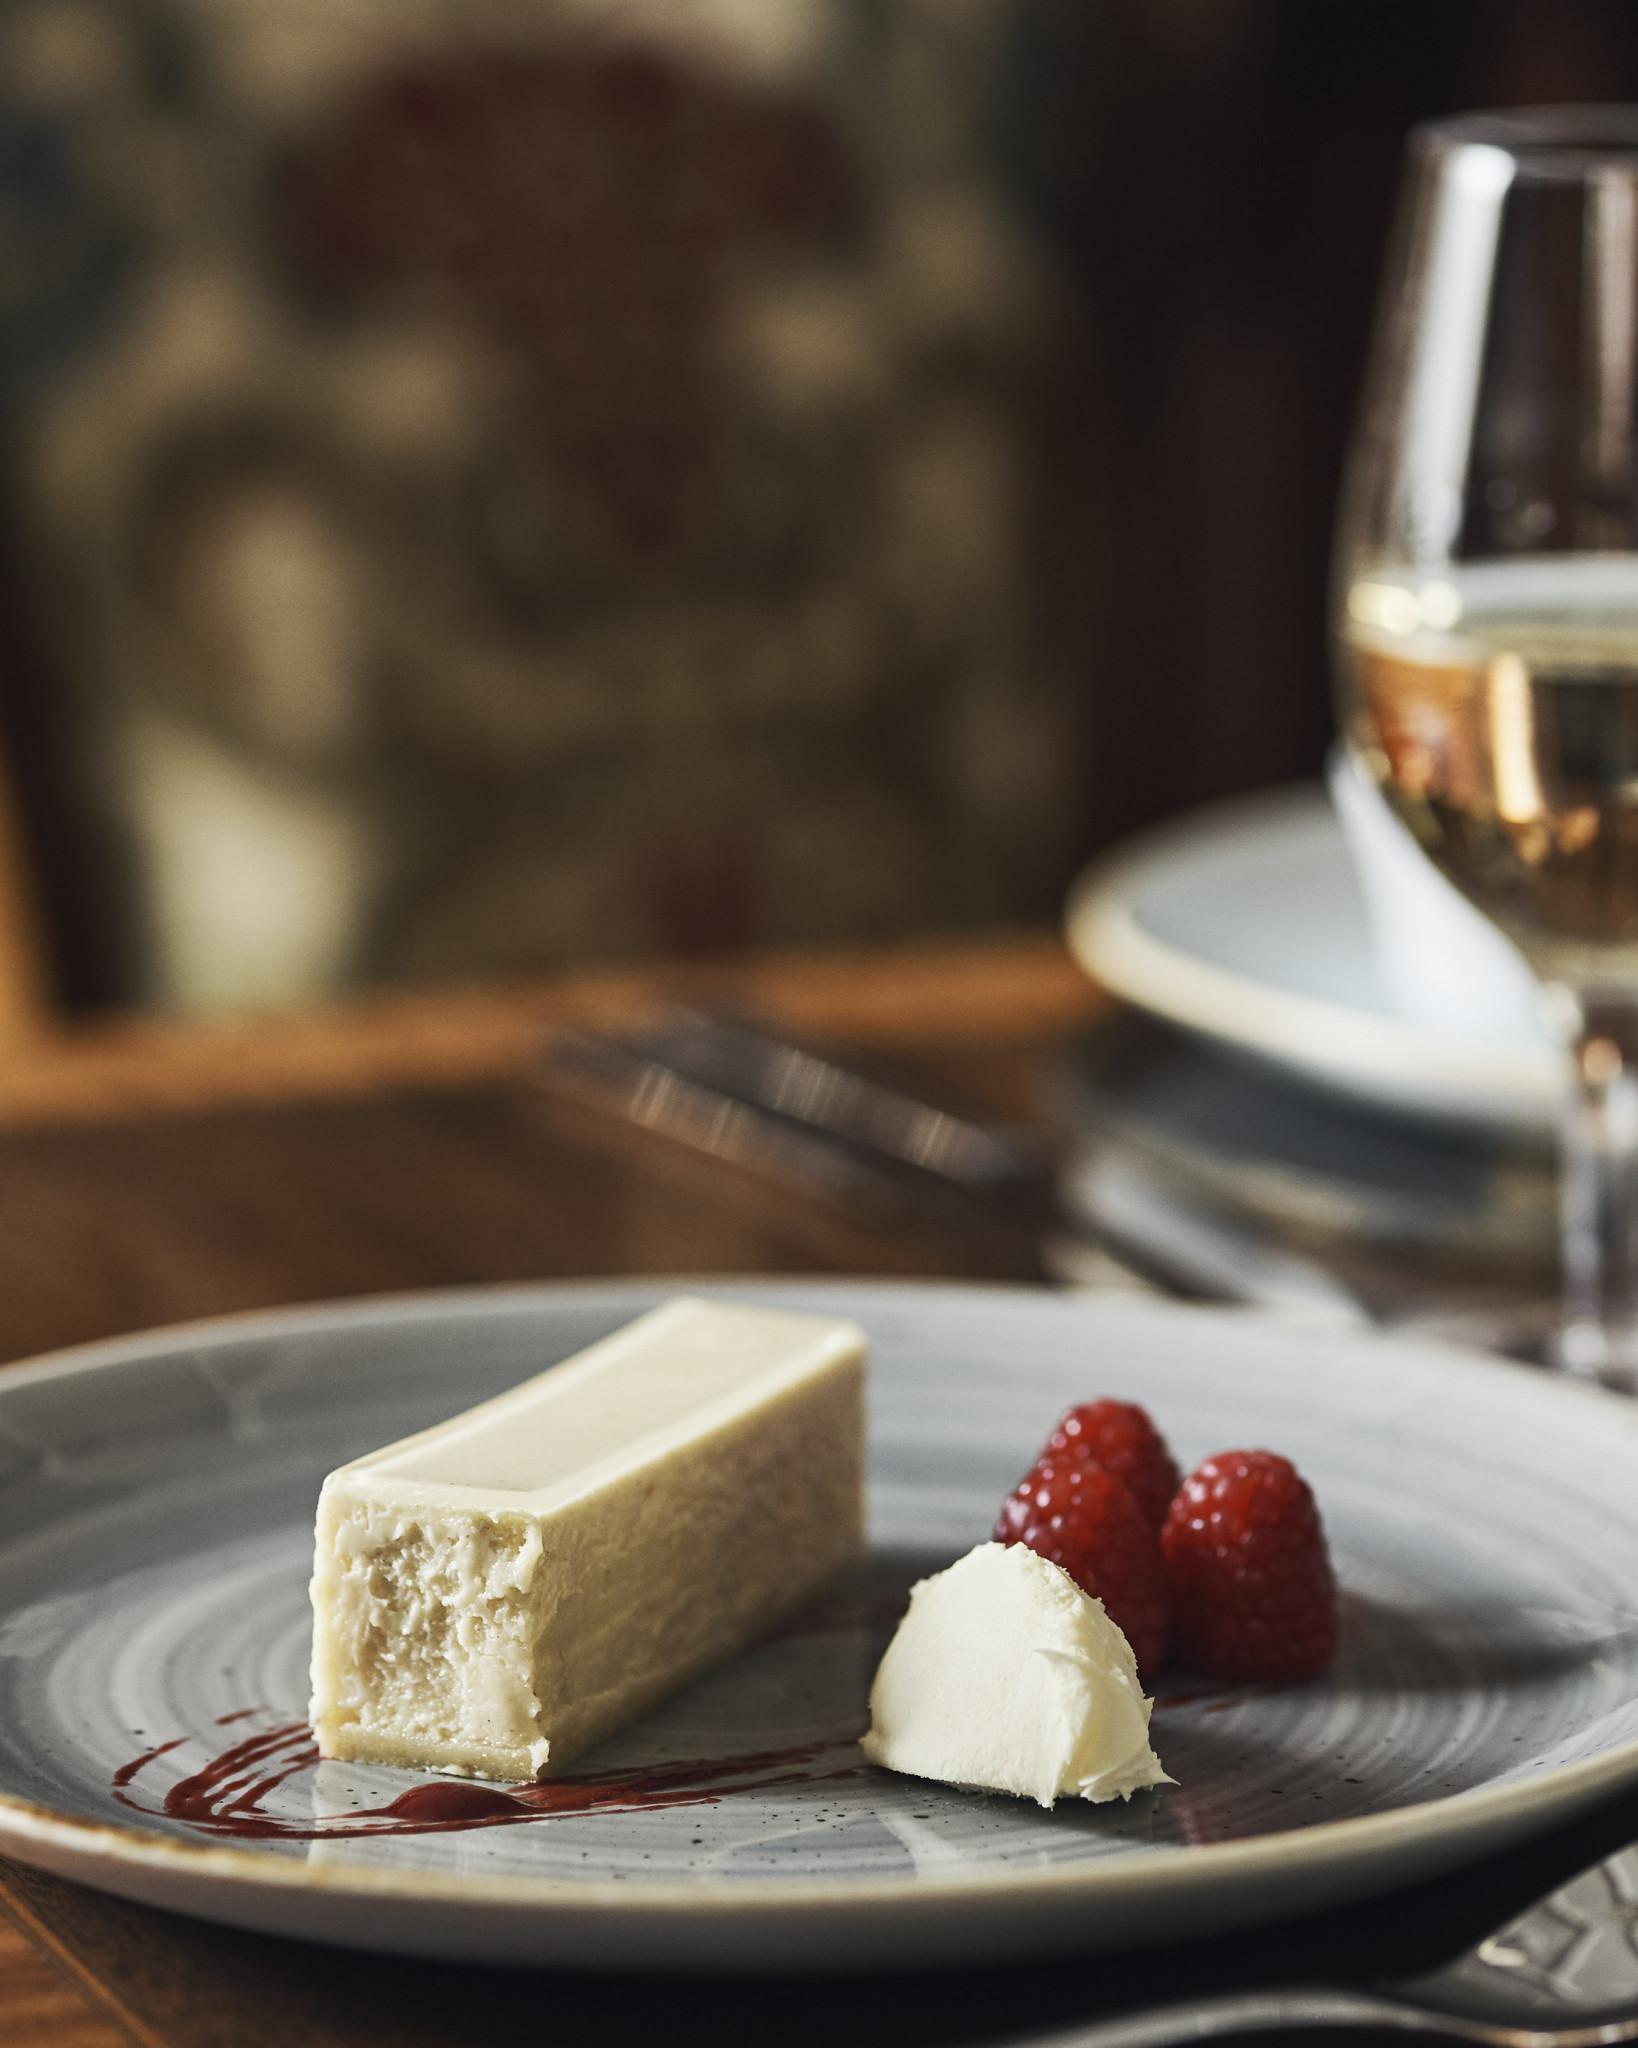 Image of a dessert